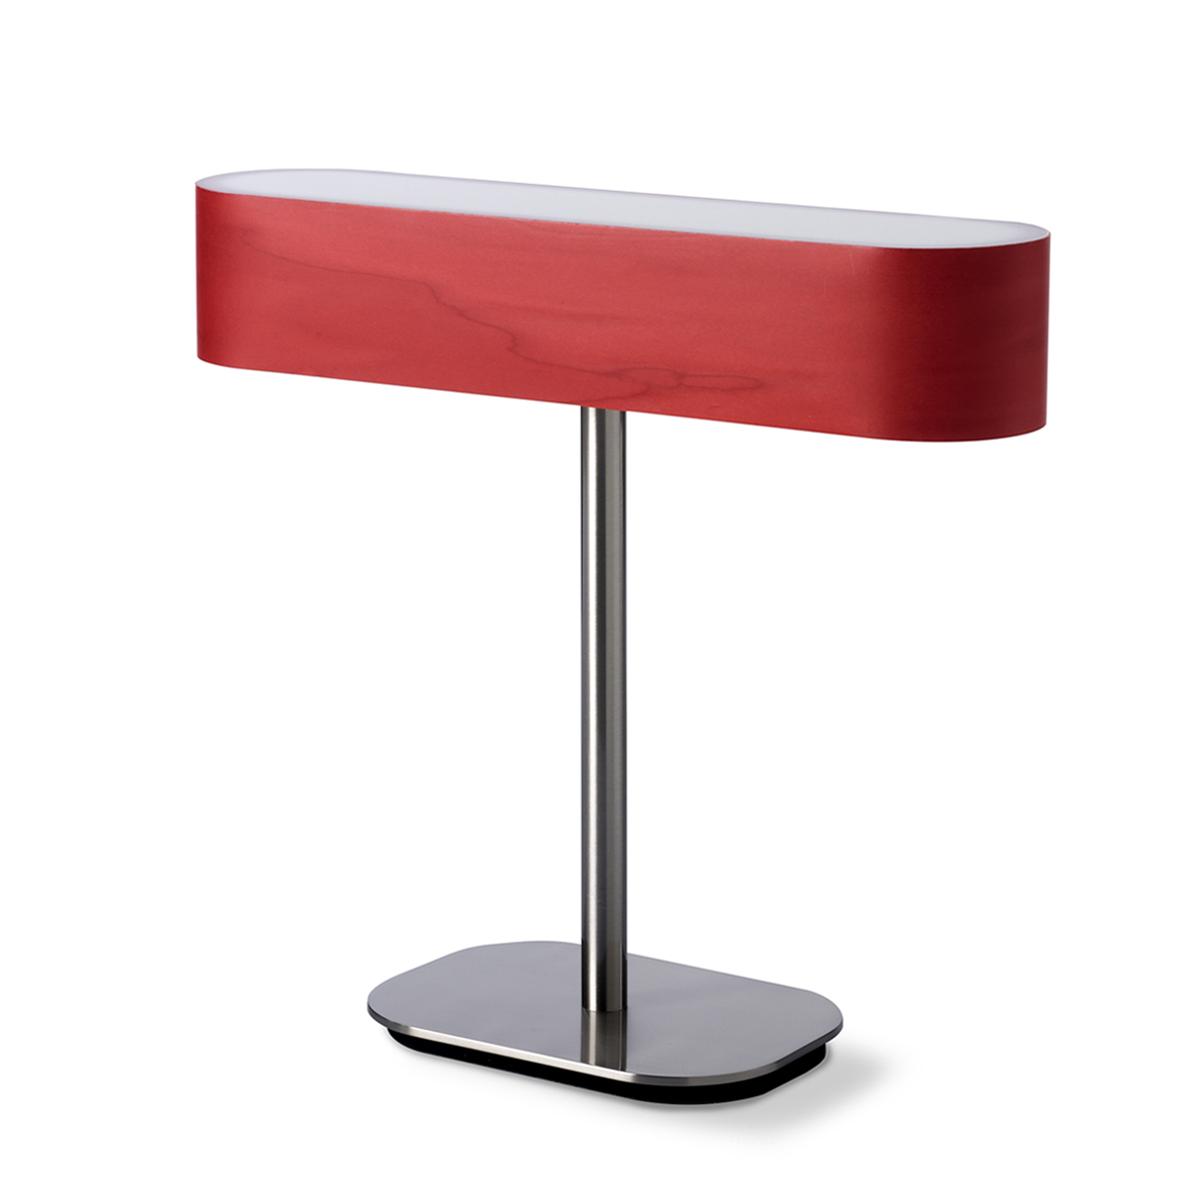 LZF Lamps I-Club LED Tischleuchte I M LED DIM 26